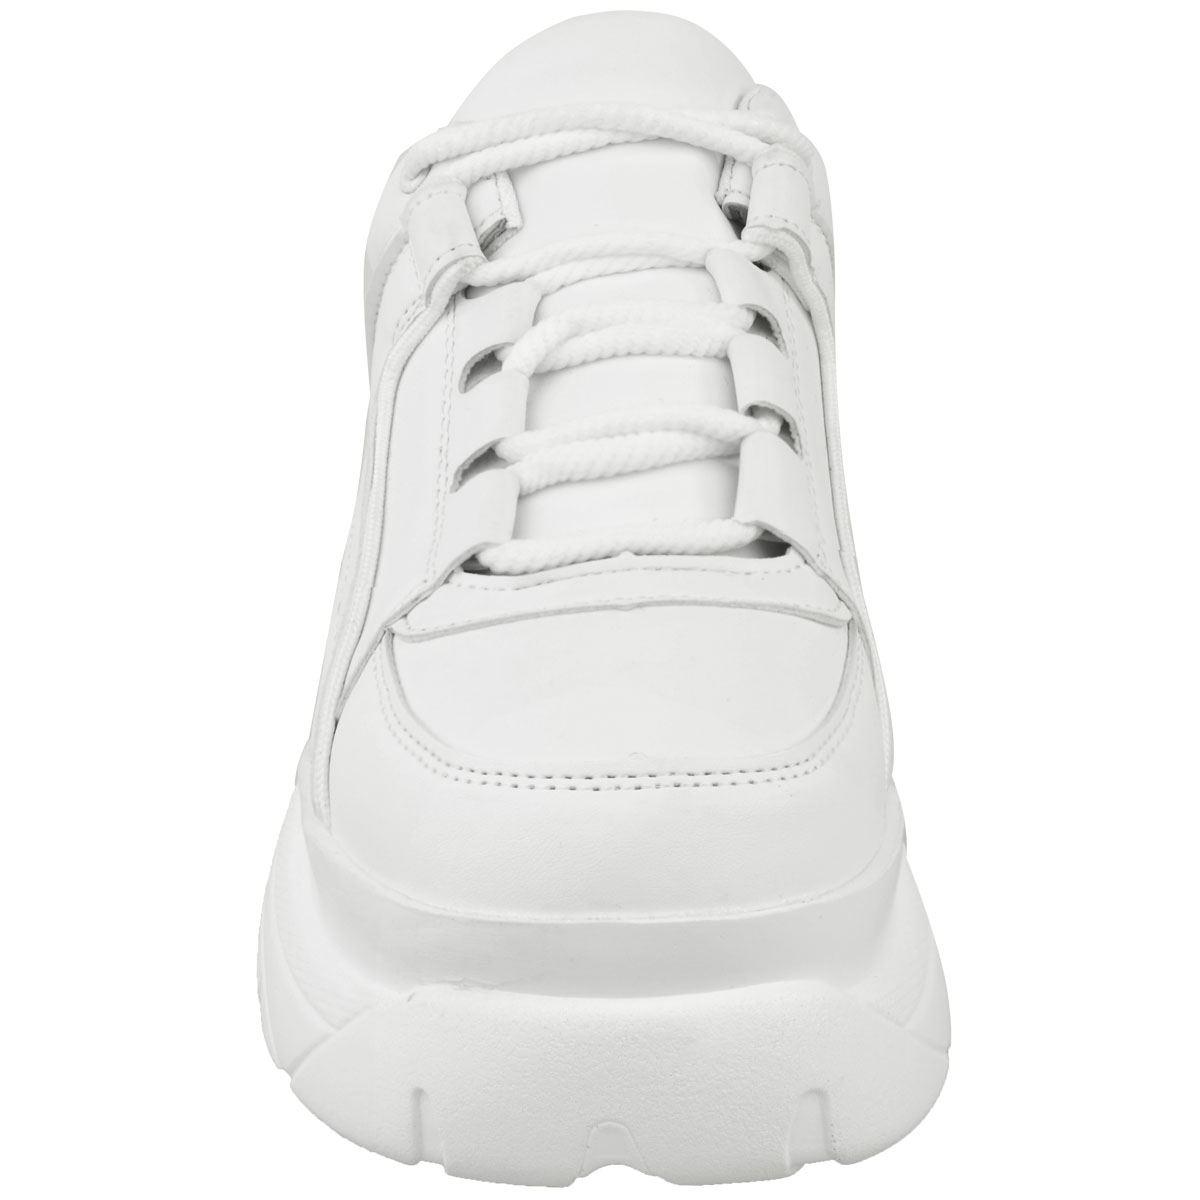 Womens-Ladies-Chunky-High-Platform-Trainers-Sneakers-White-Retro-Punk-Rock-New thumbnail 16